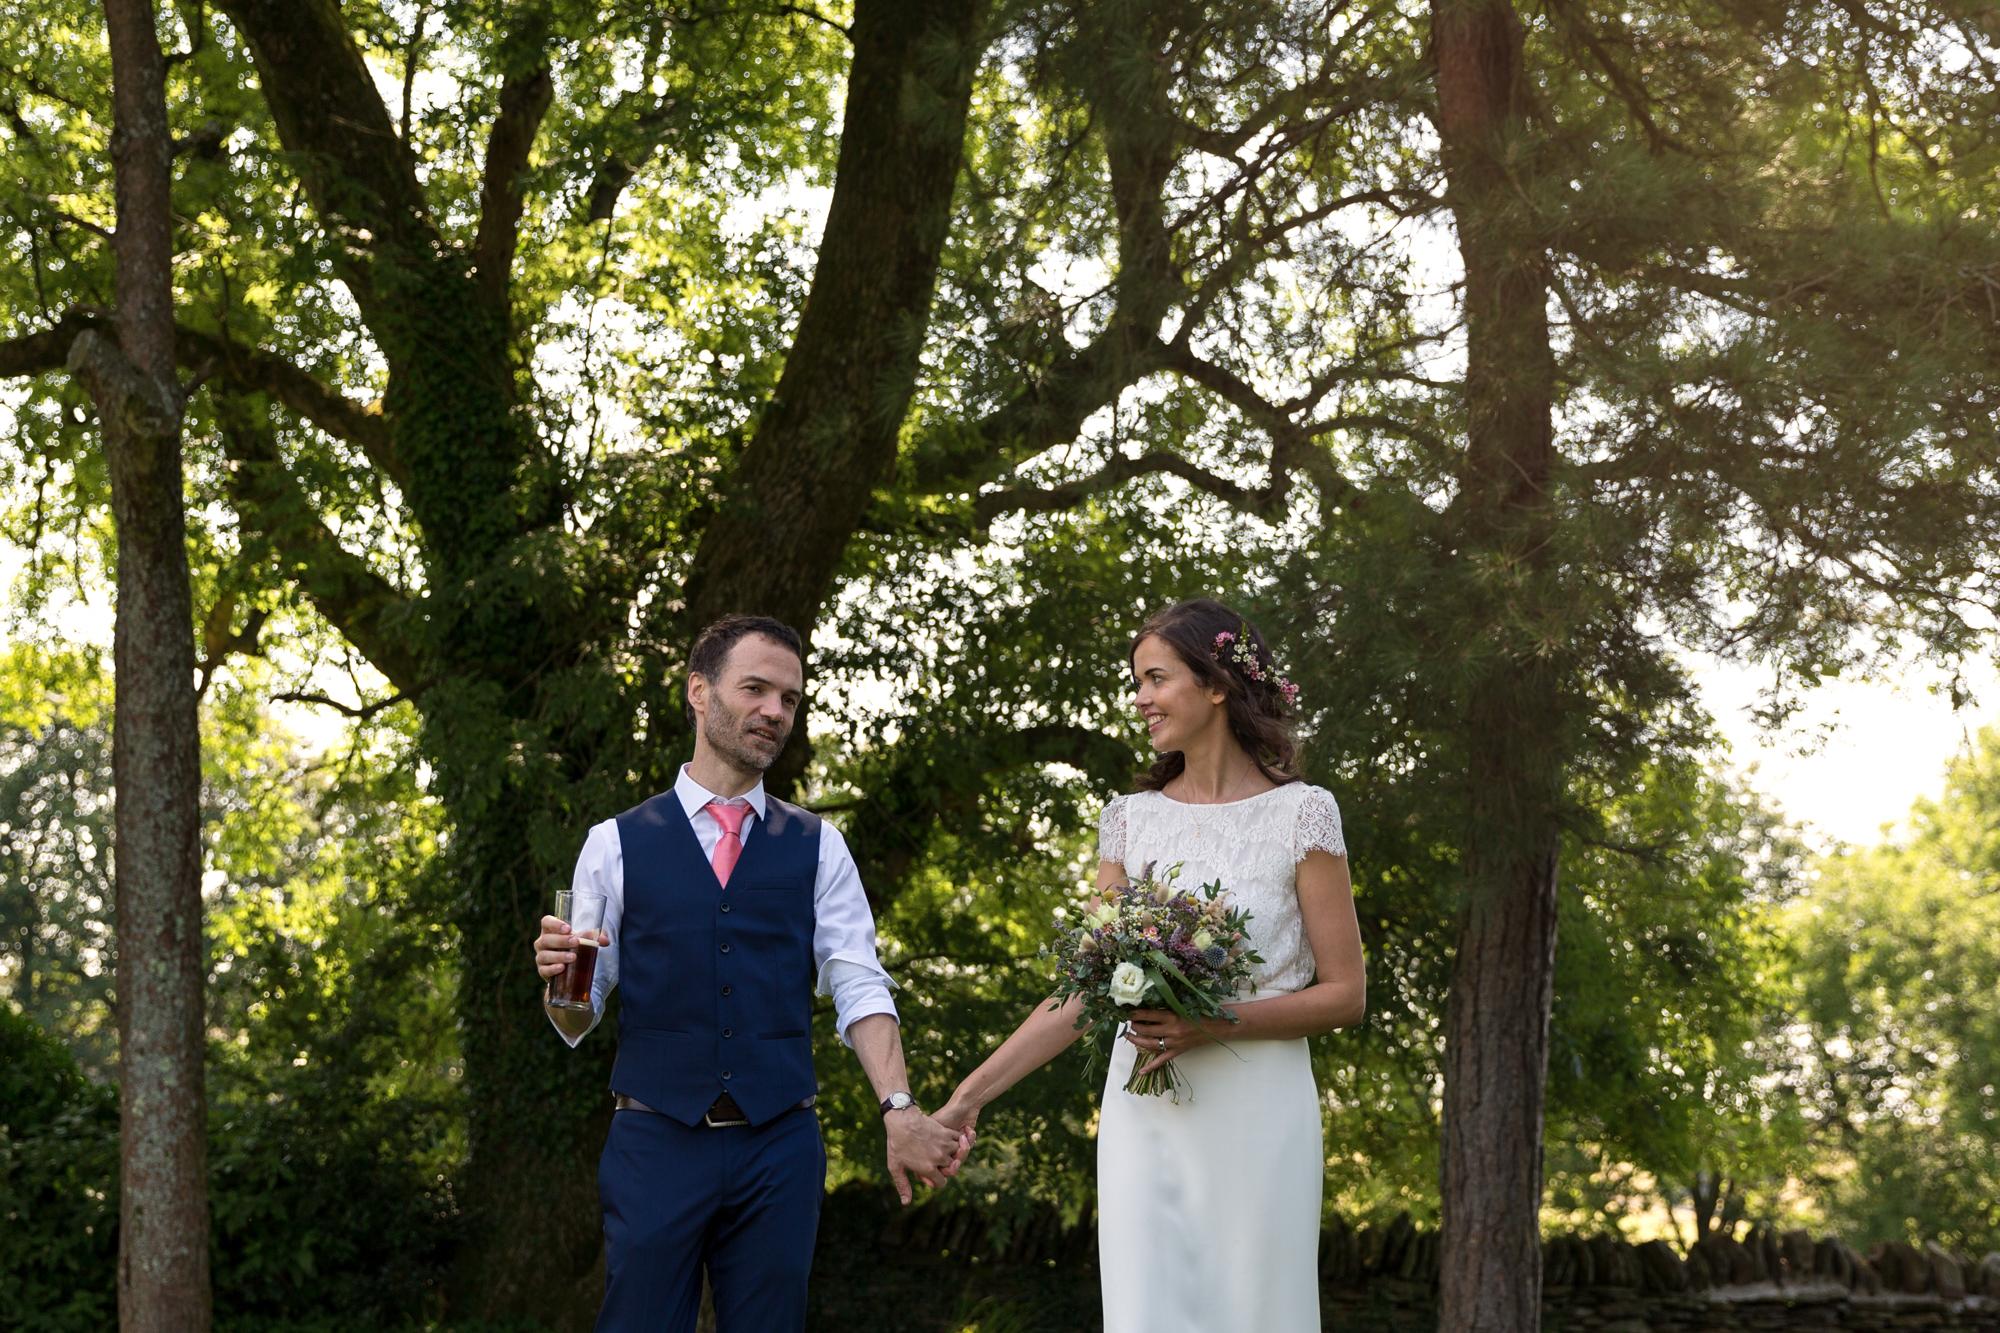 sunny bride and groom wedding photos at llechwen hall wedding